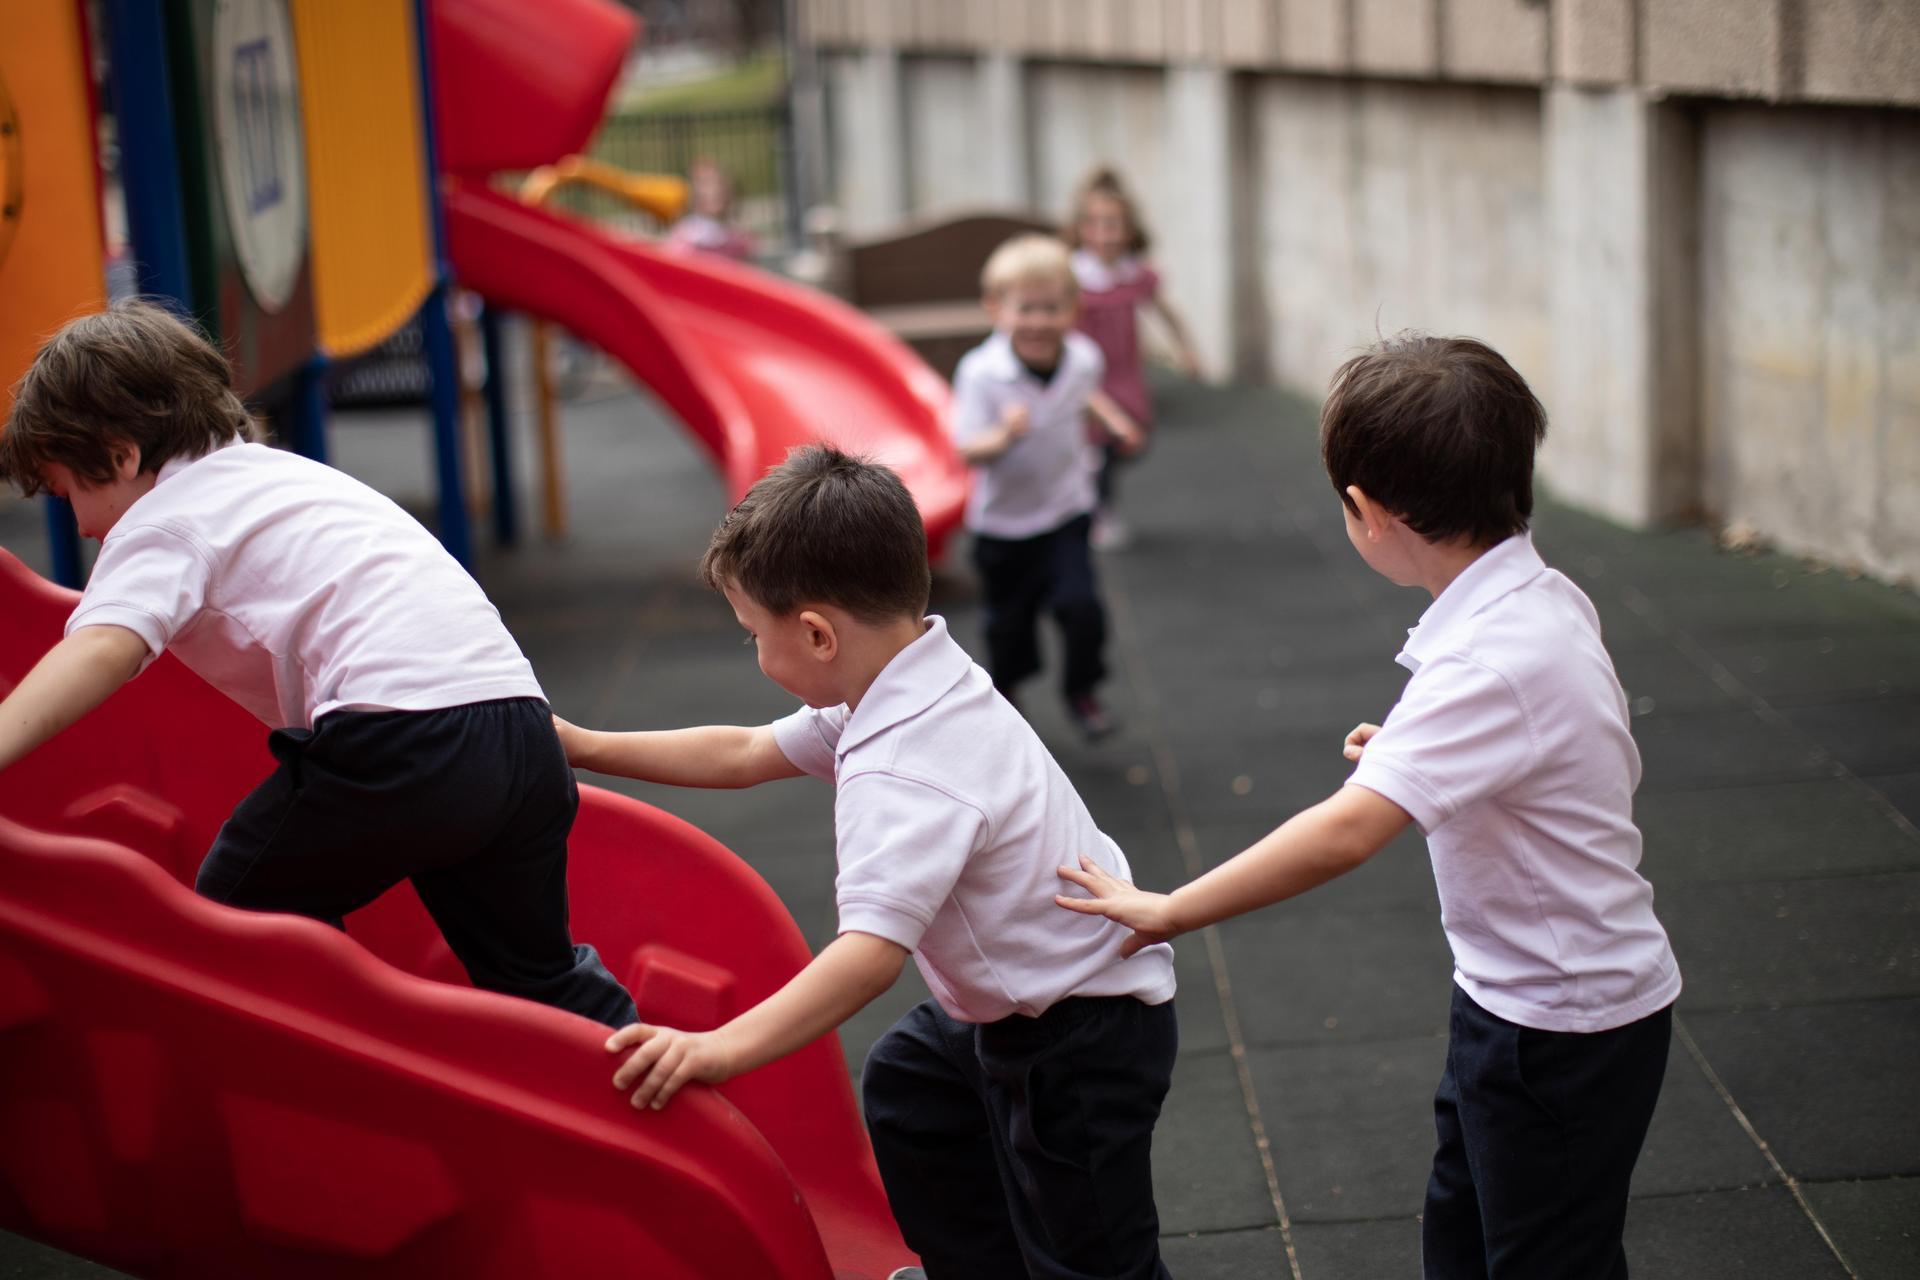 Boys on the playground